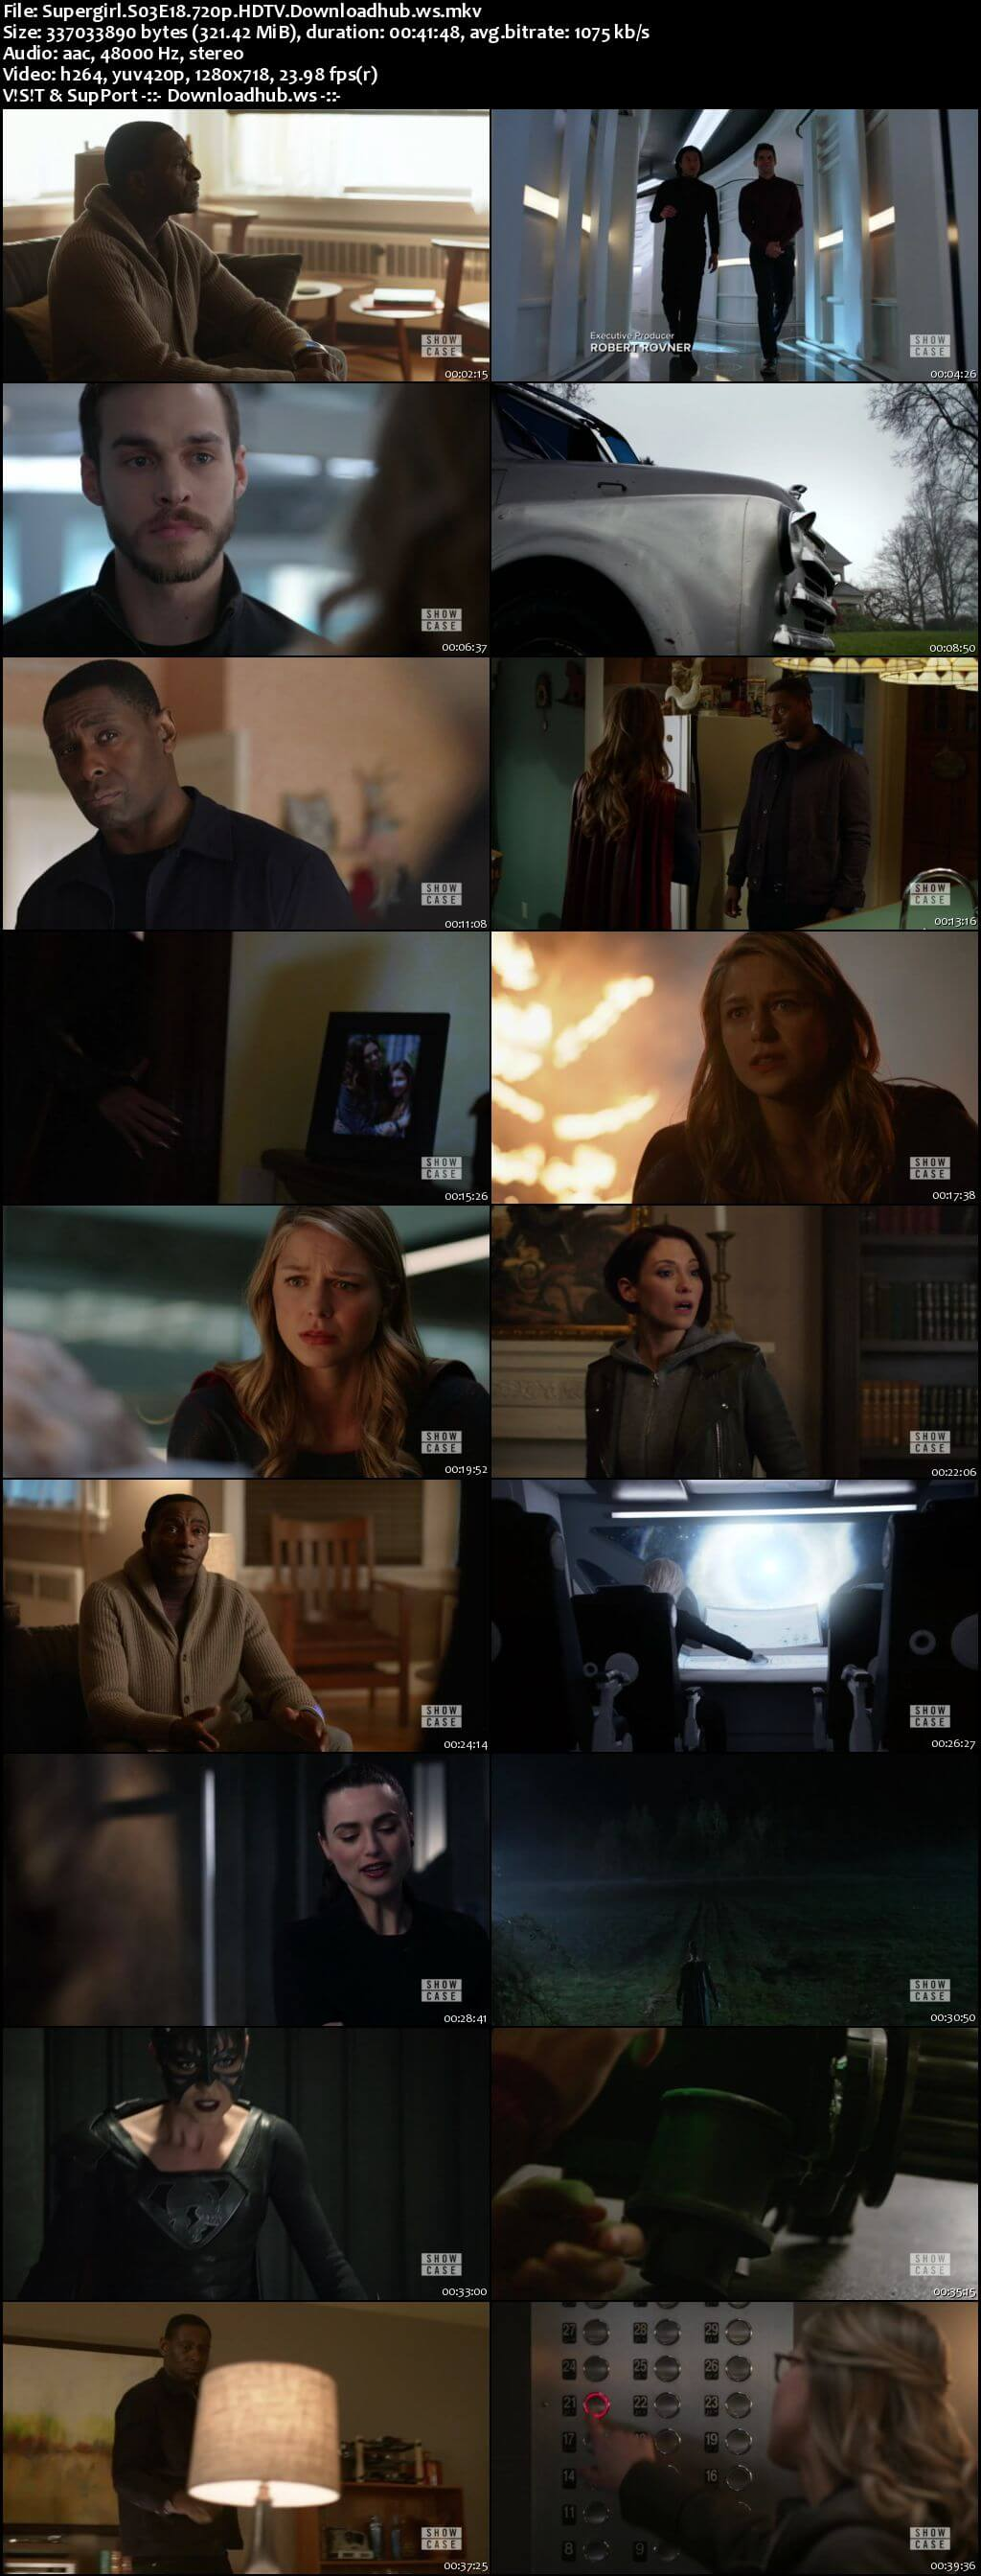 Supergirl S03E18 321MB HDTV 720p x264